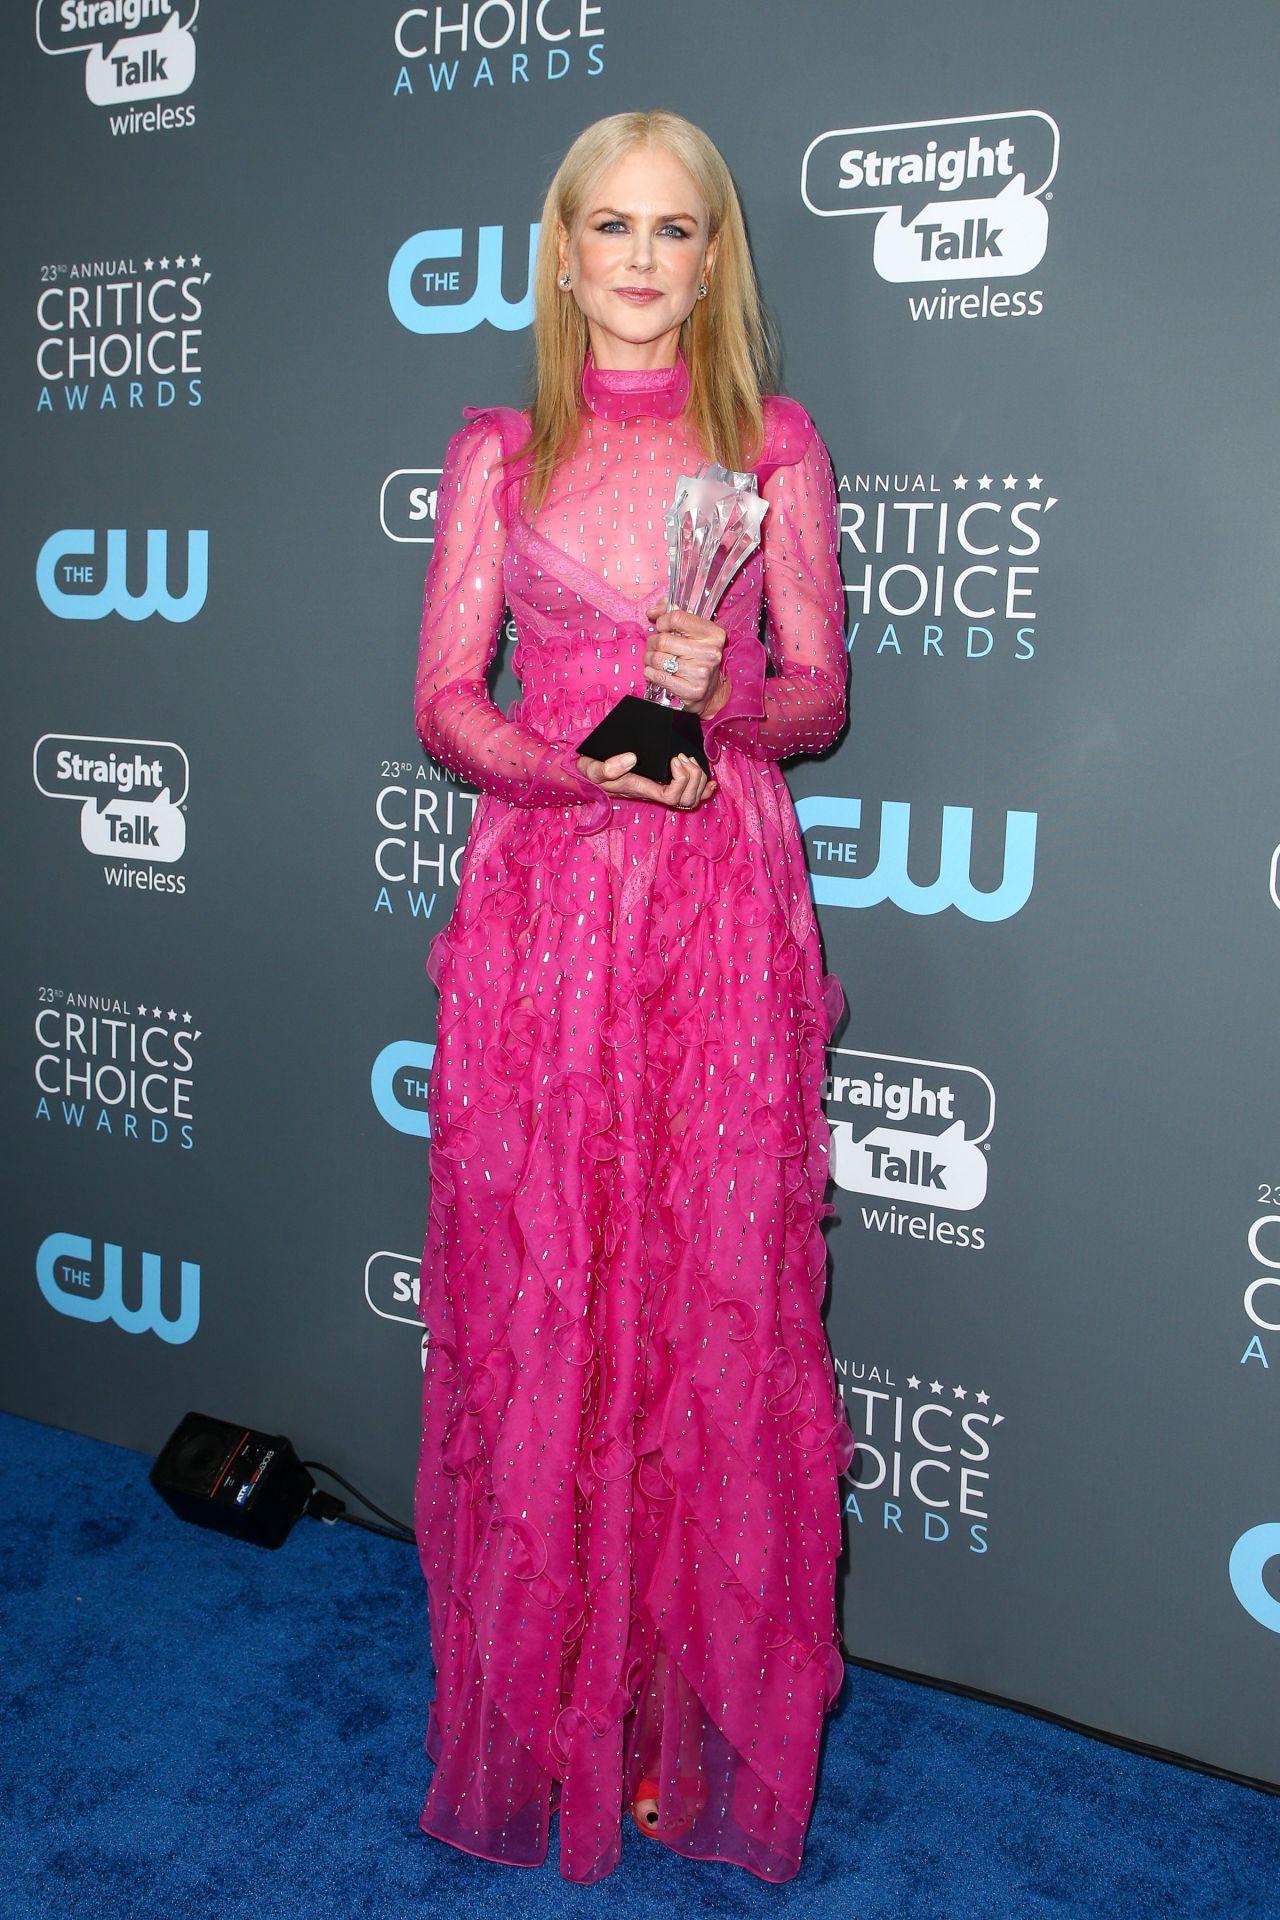 http://celebmafia.com/wp-content/uploads/2018/01/nicole-kidman-2018-critics-choice-awards-9.jpg